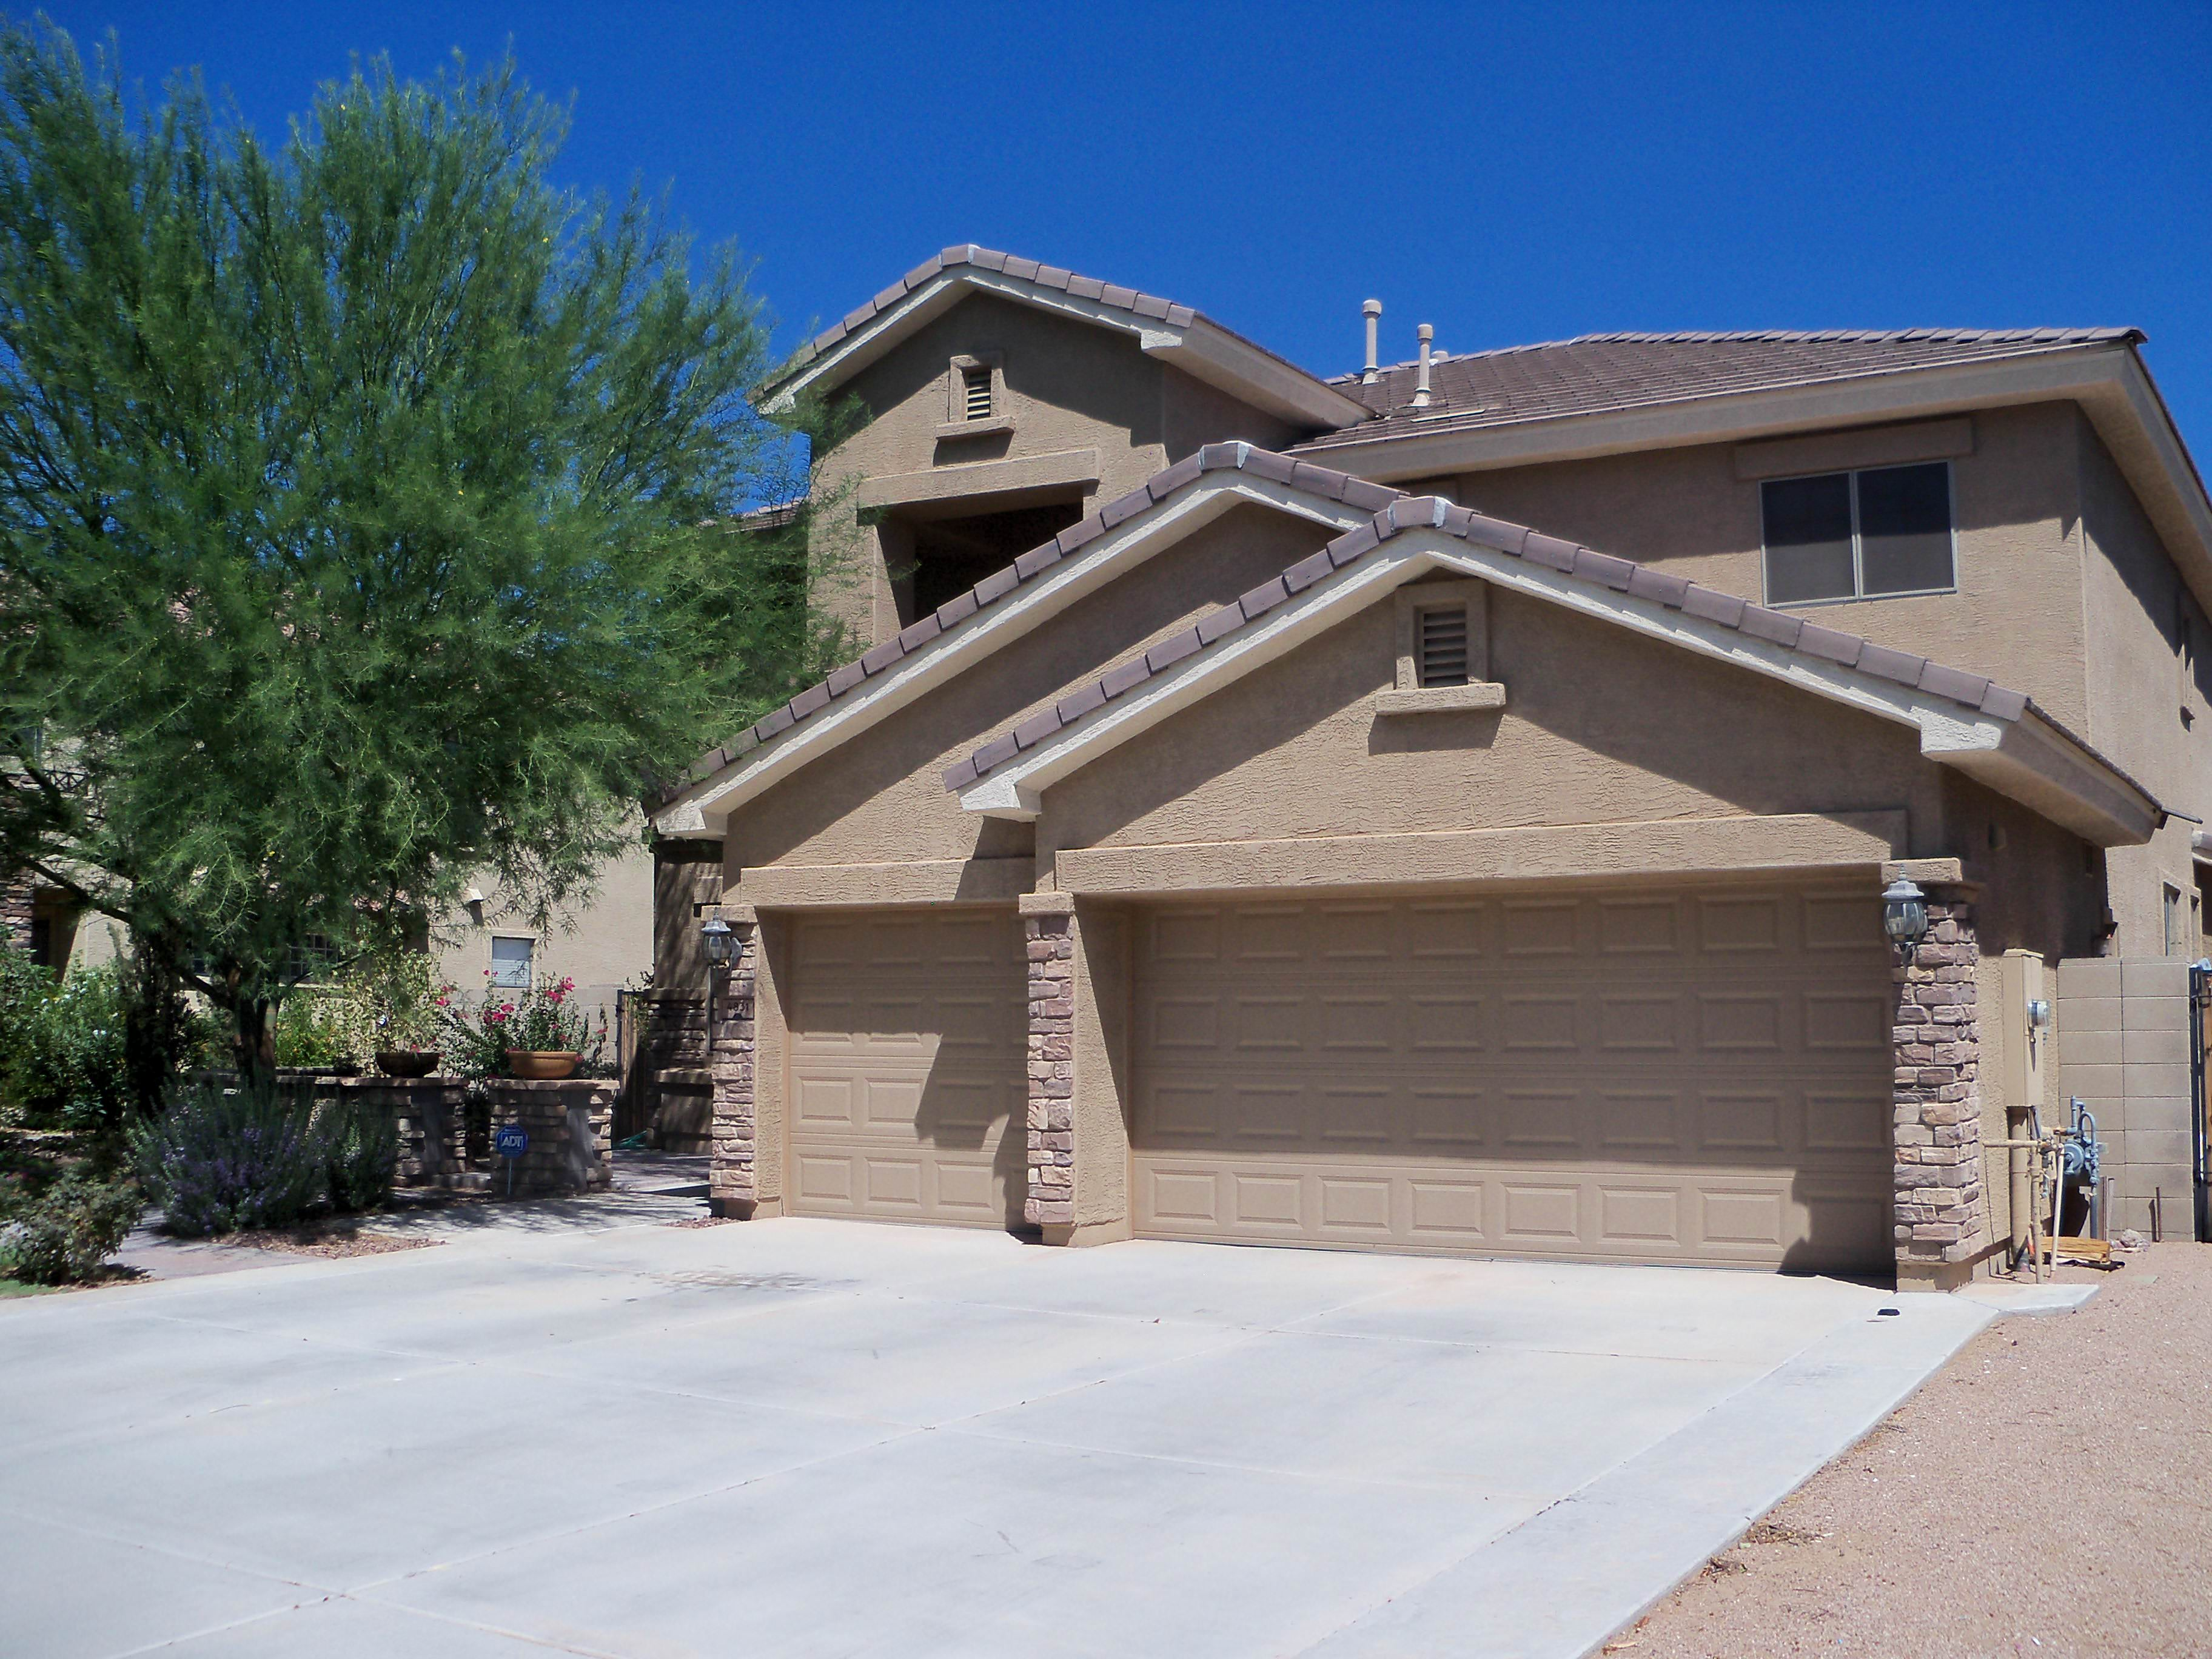 5 Bedroom Mesa Az Pool Home For Sale